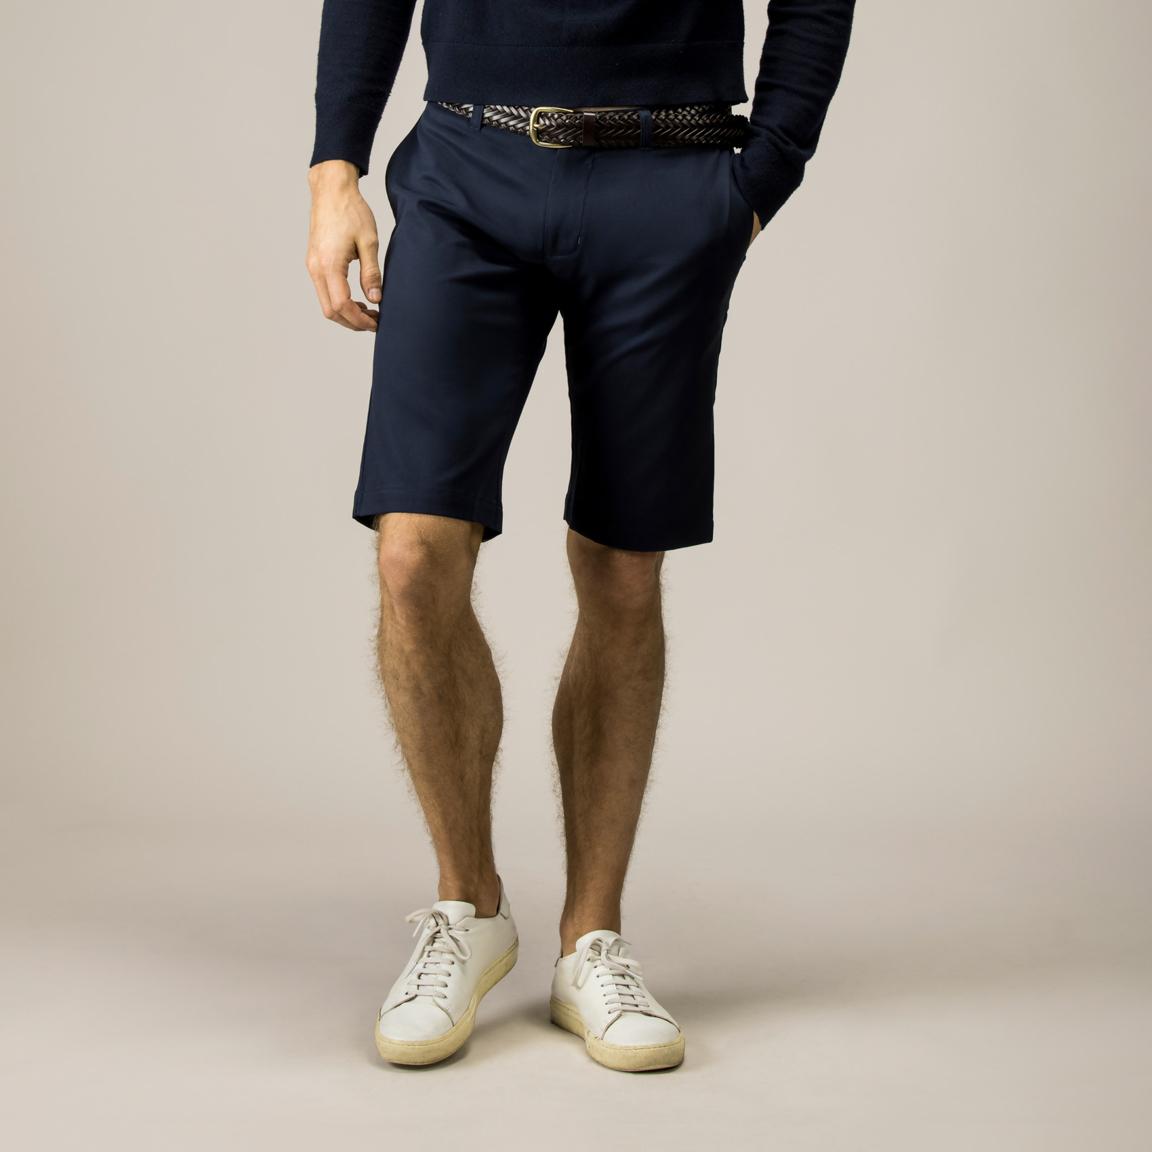 Marineblaue Shorts mit Stretch